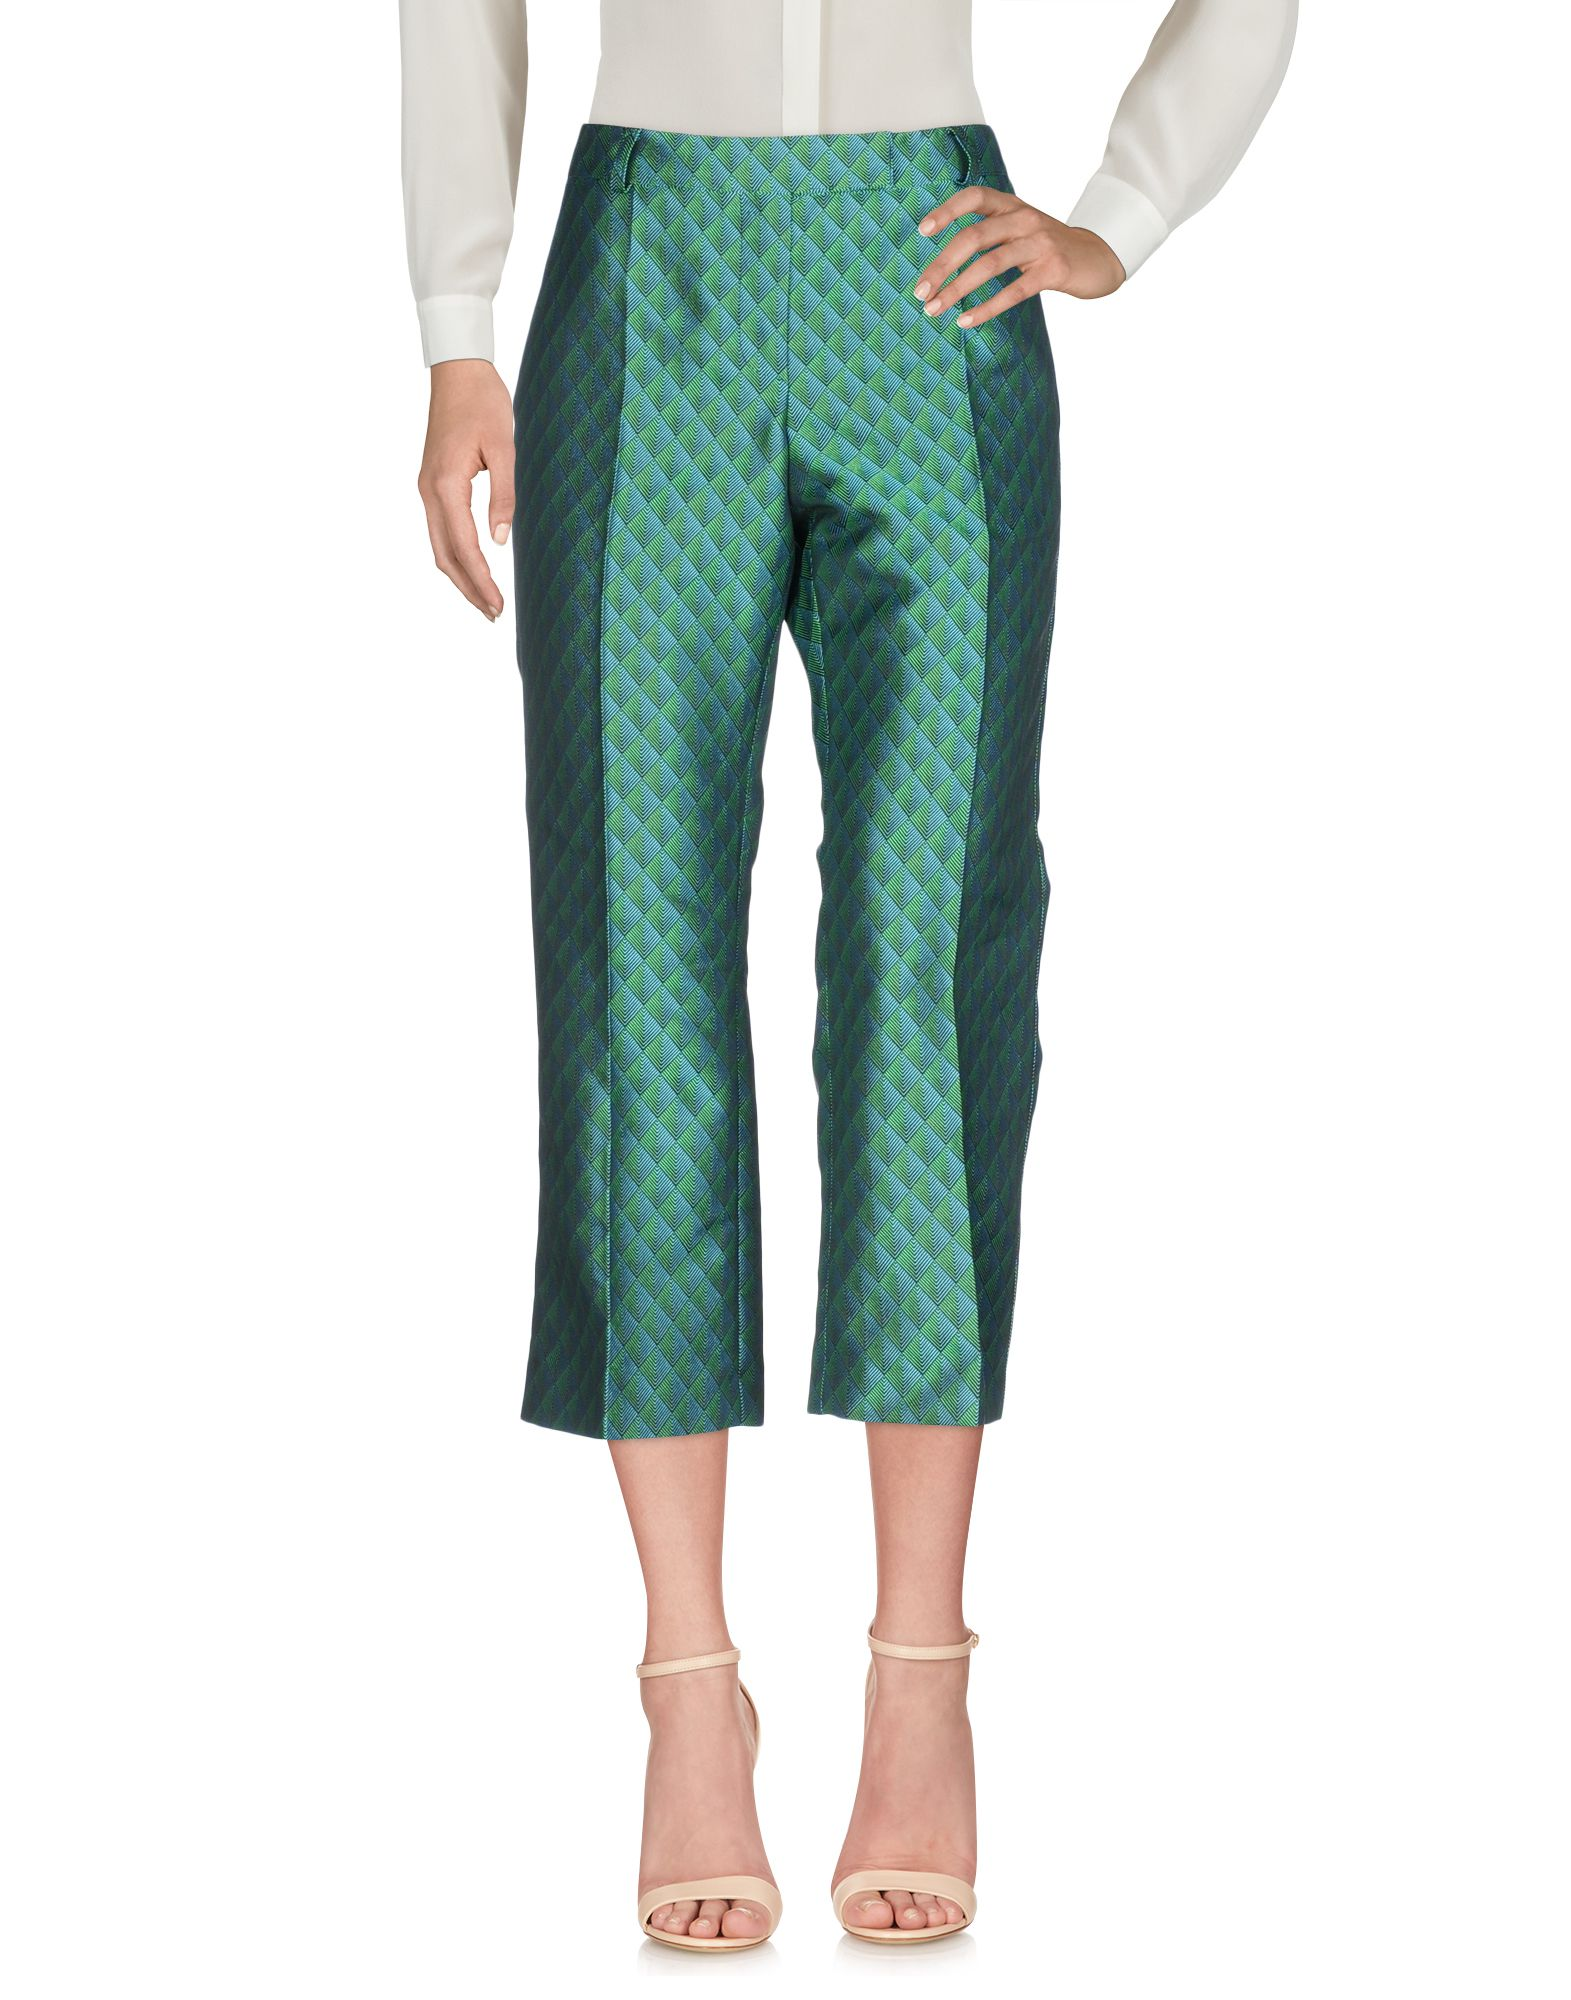 MAISON COMMON Повседневные брюки купить common interface на самсунг